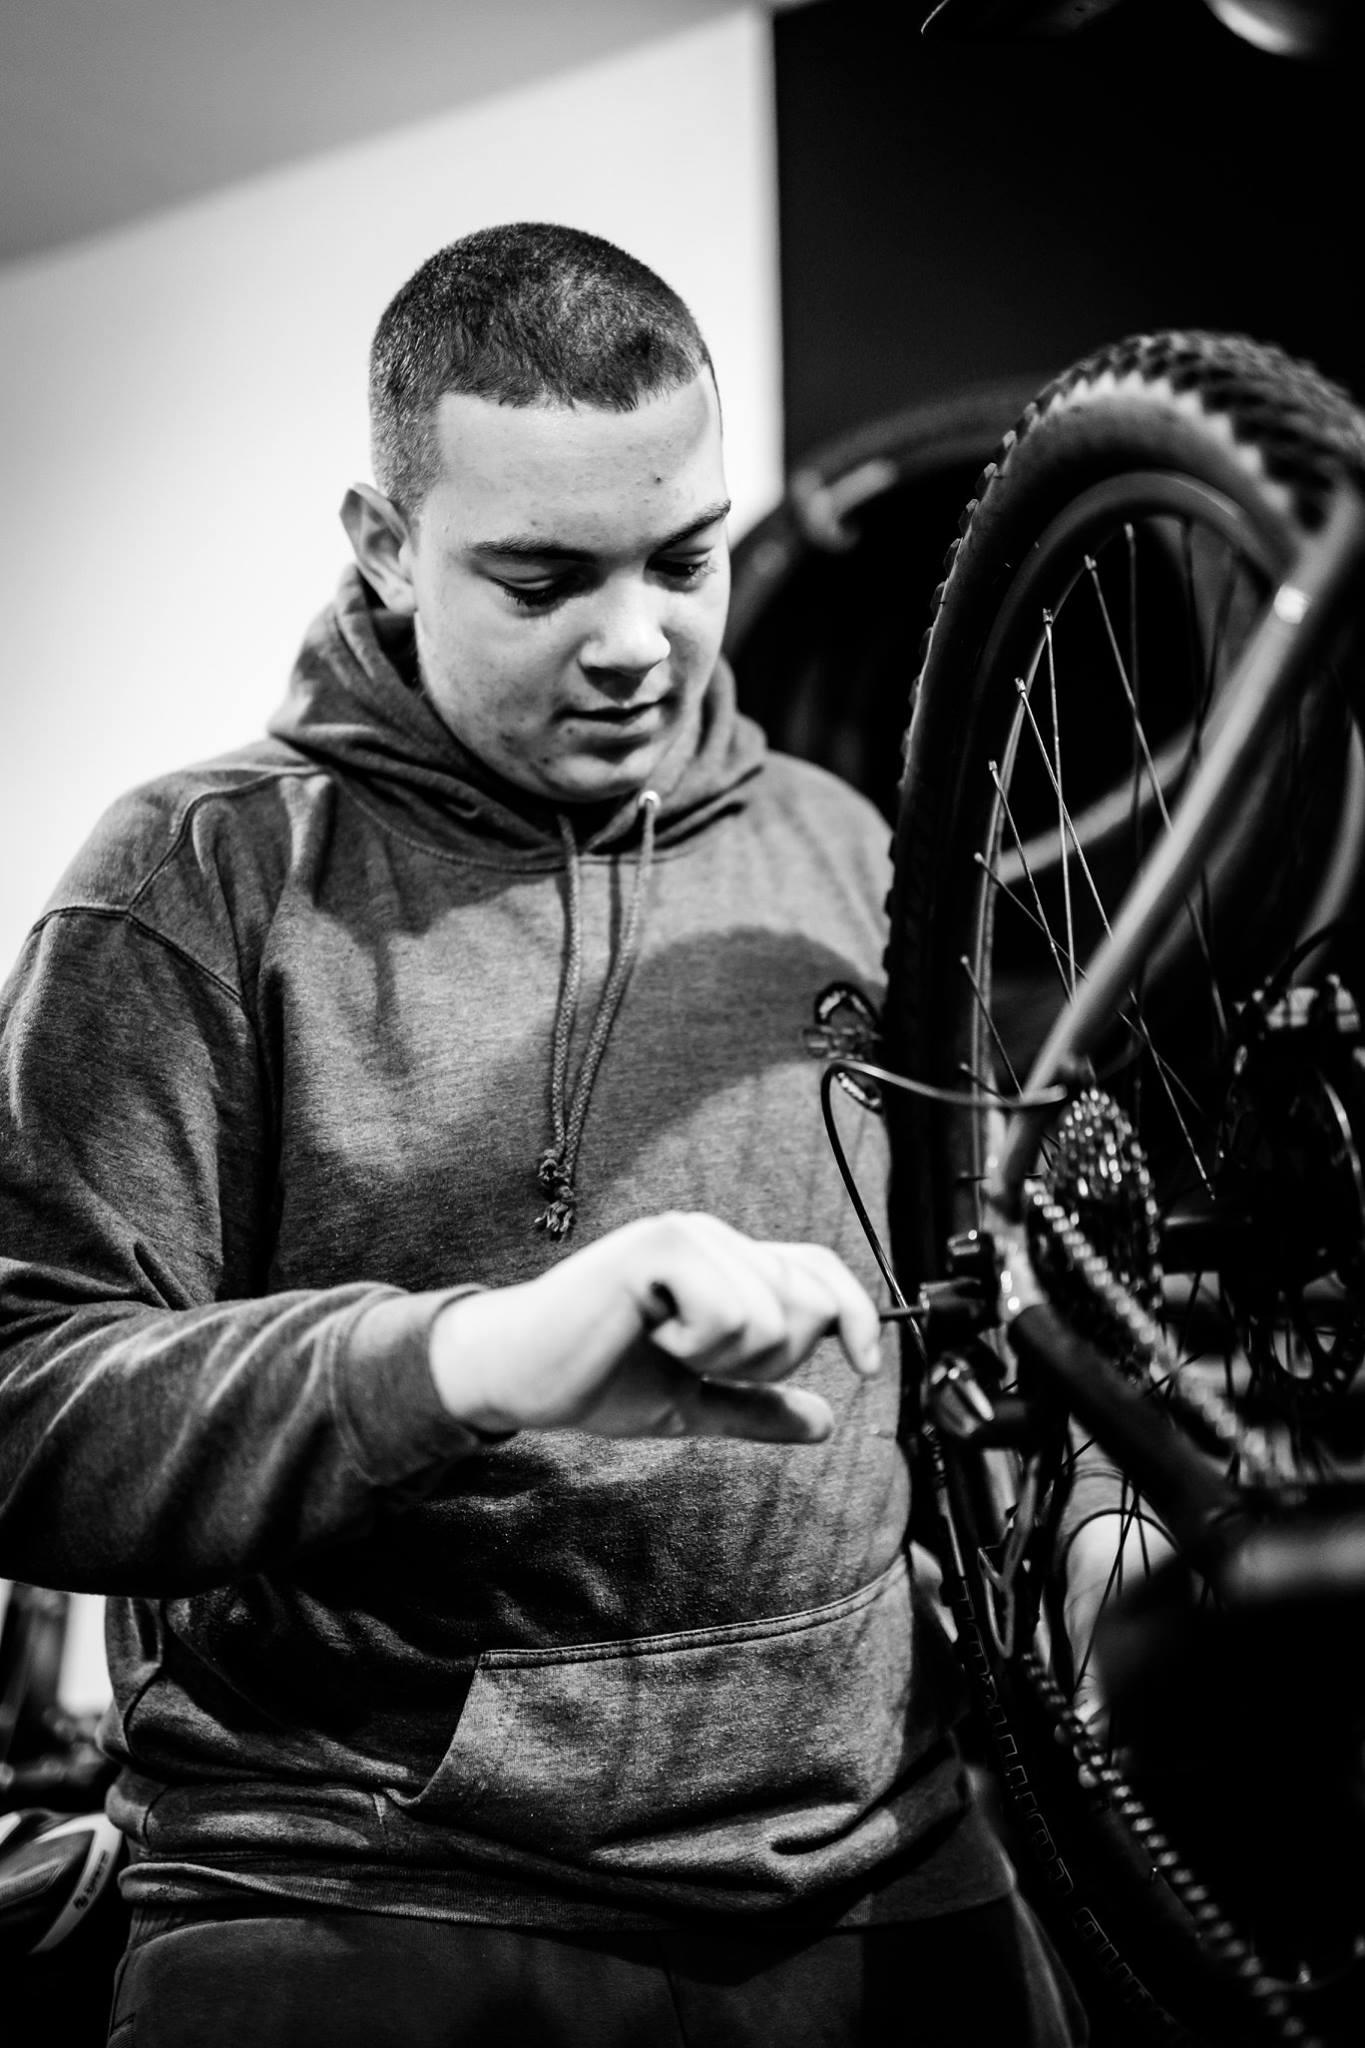 Birmingham bike shop, servicing, sales and advice